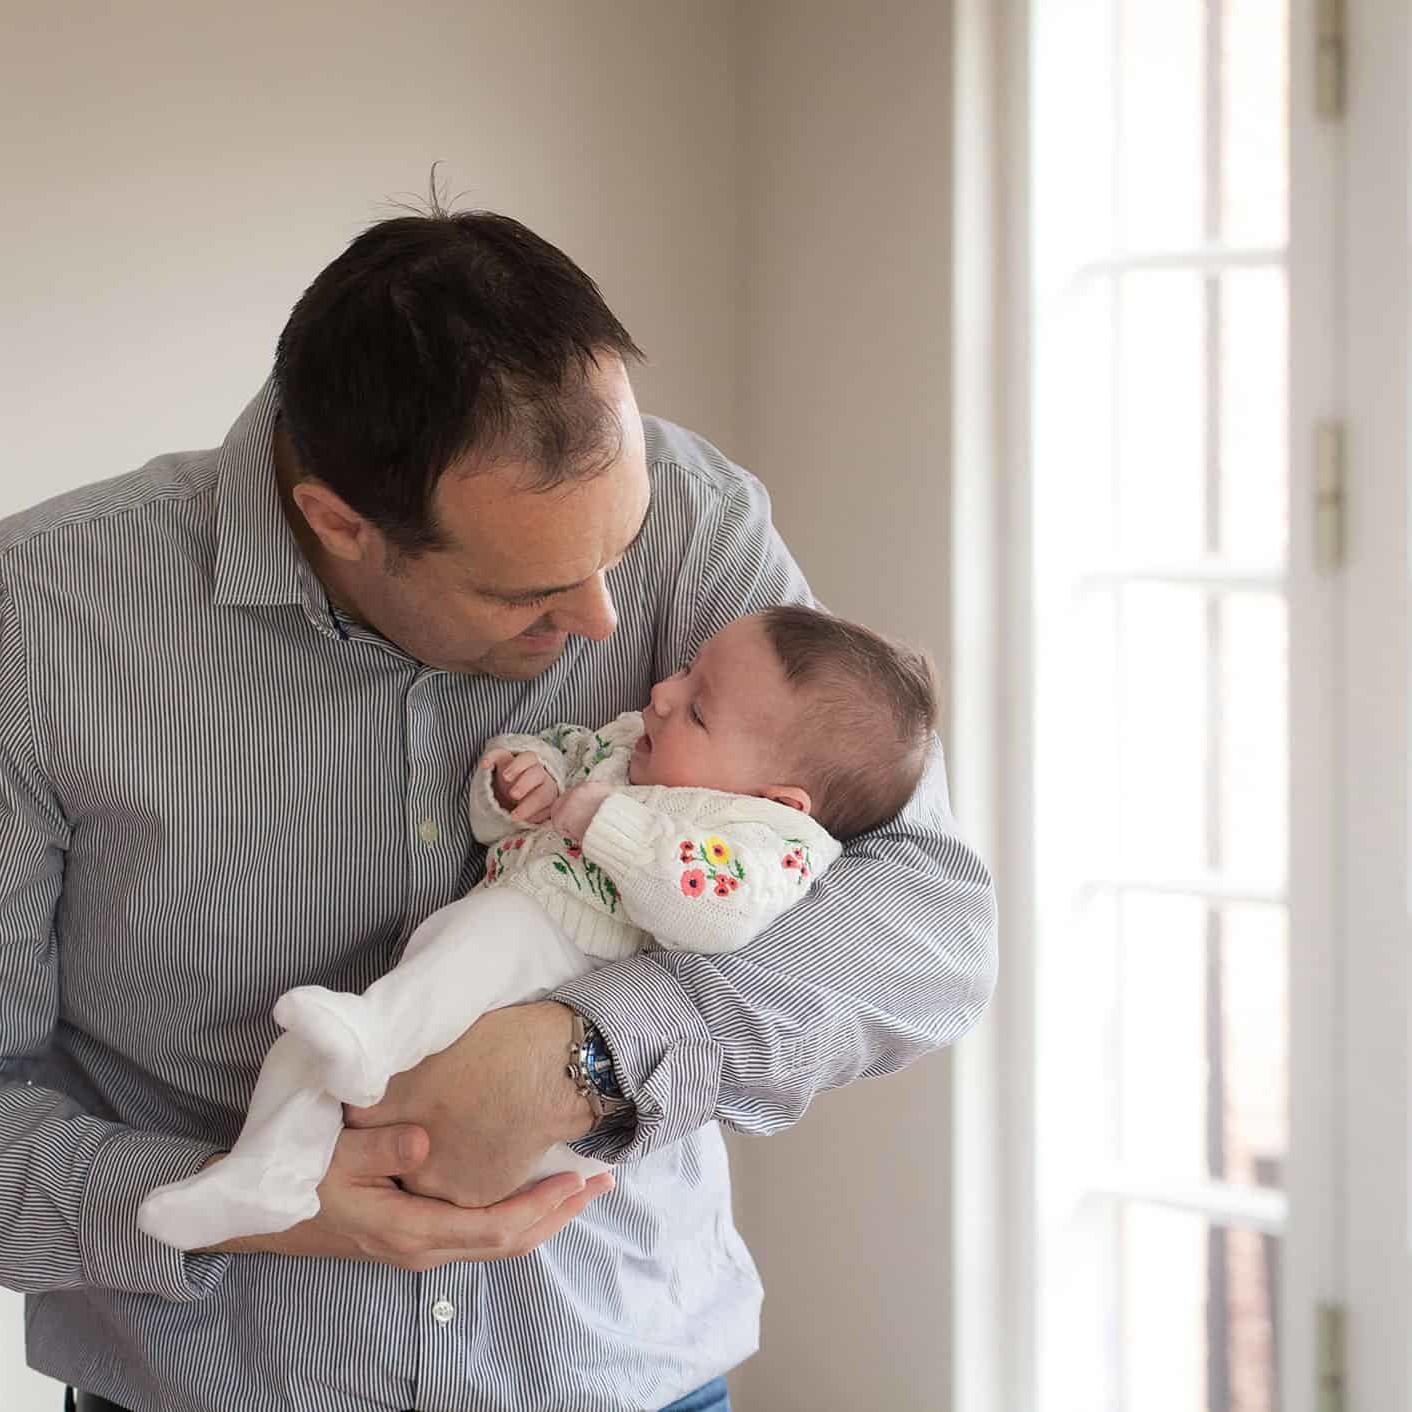 Newborn Photoshoots at home. Edinburgh and surrounding areas. 64